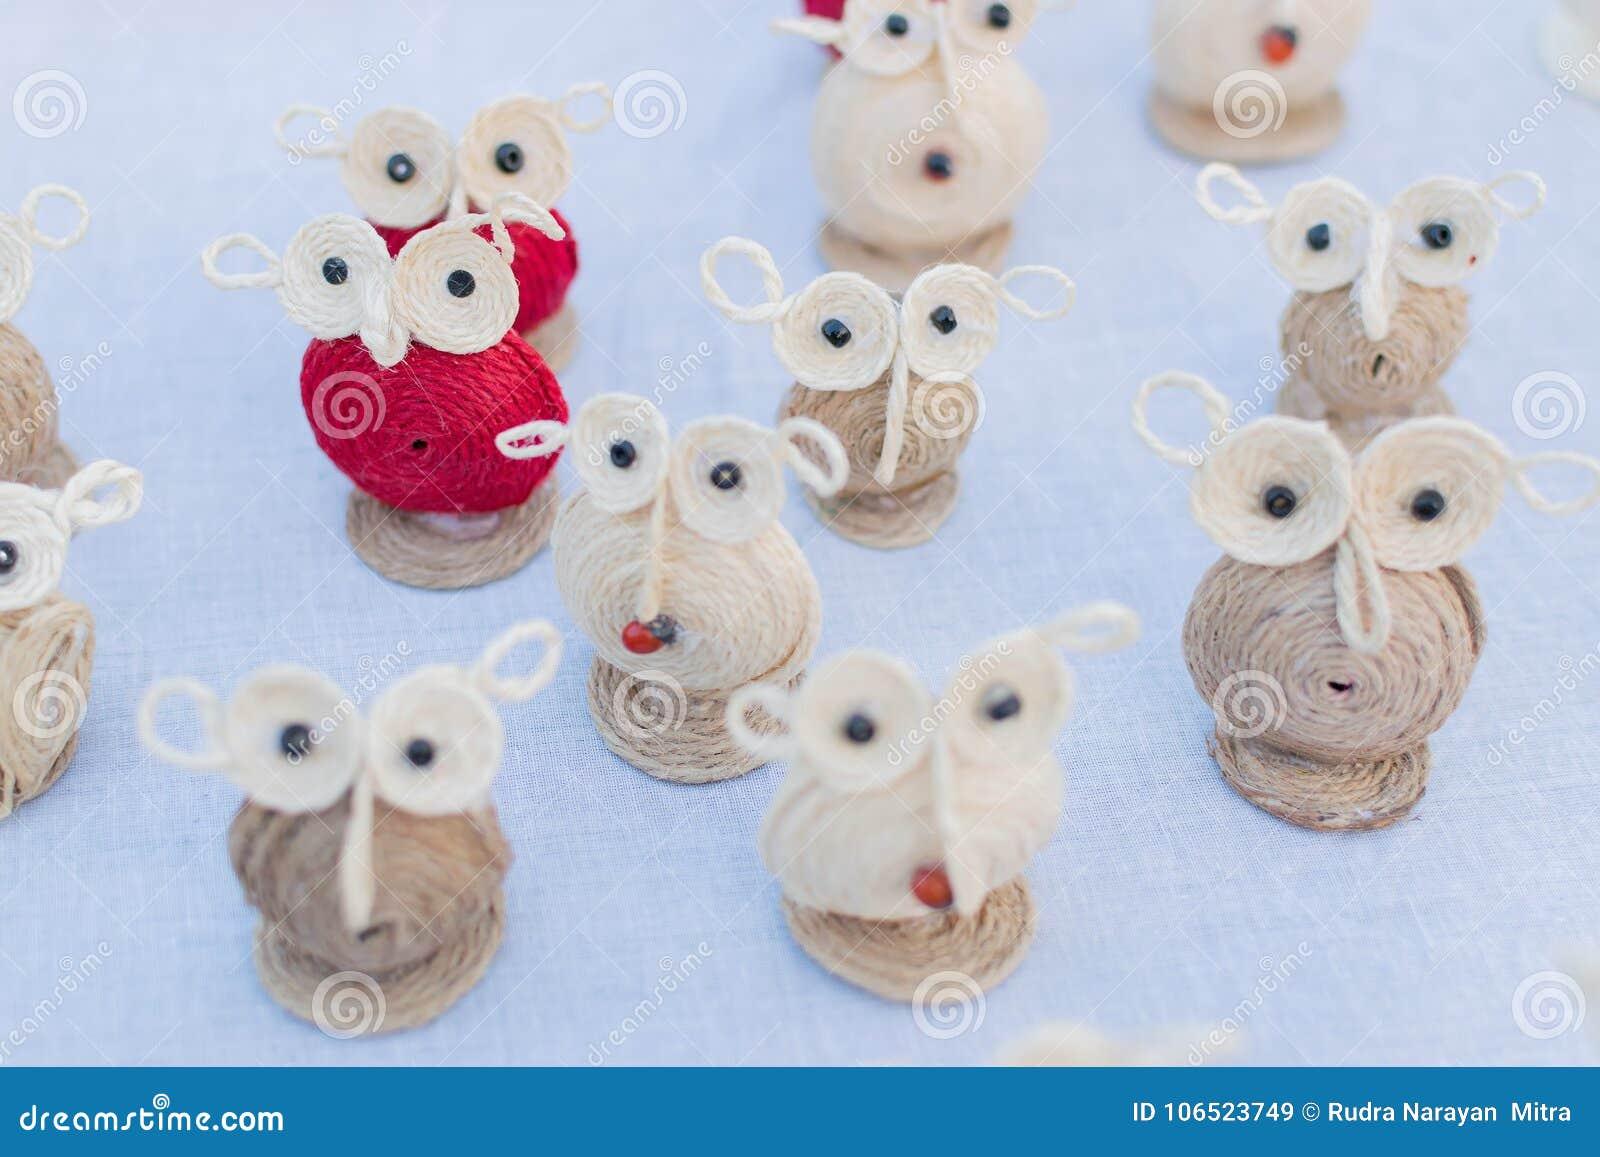 Dolls Of Owls Art Work Indian Handicrafts Fair At Kolkata Stock